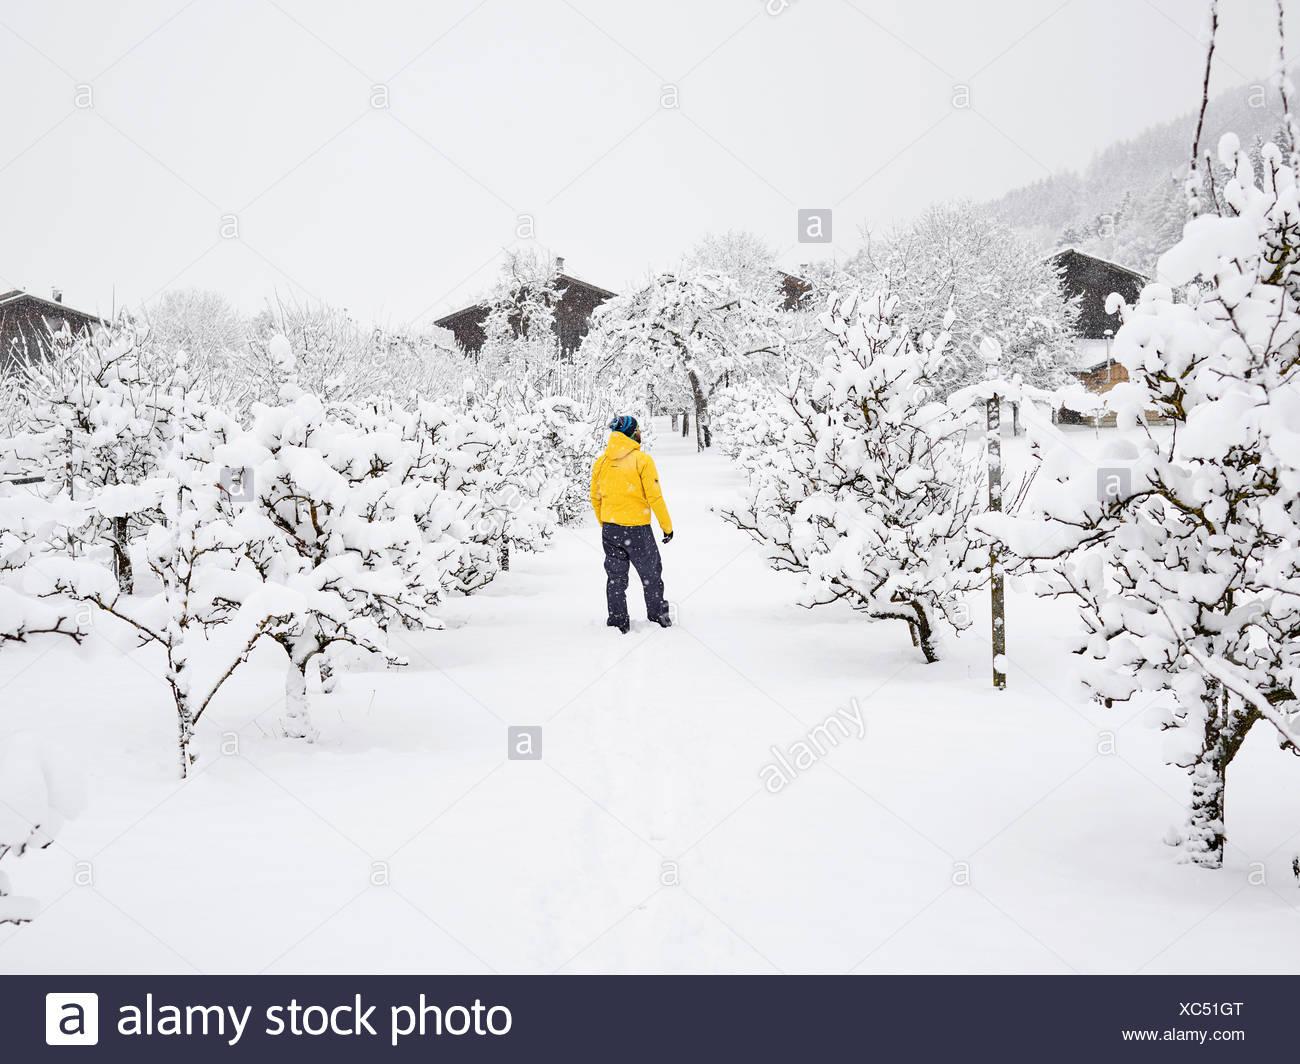 Man with yellow winter jacket in orchard, winter, snow, Kolsass, Tyrol, Austria - Stock Image